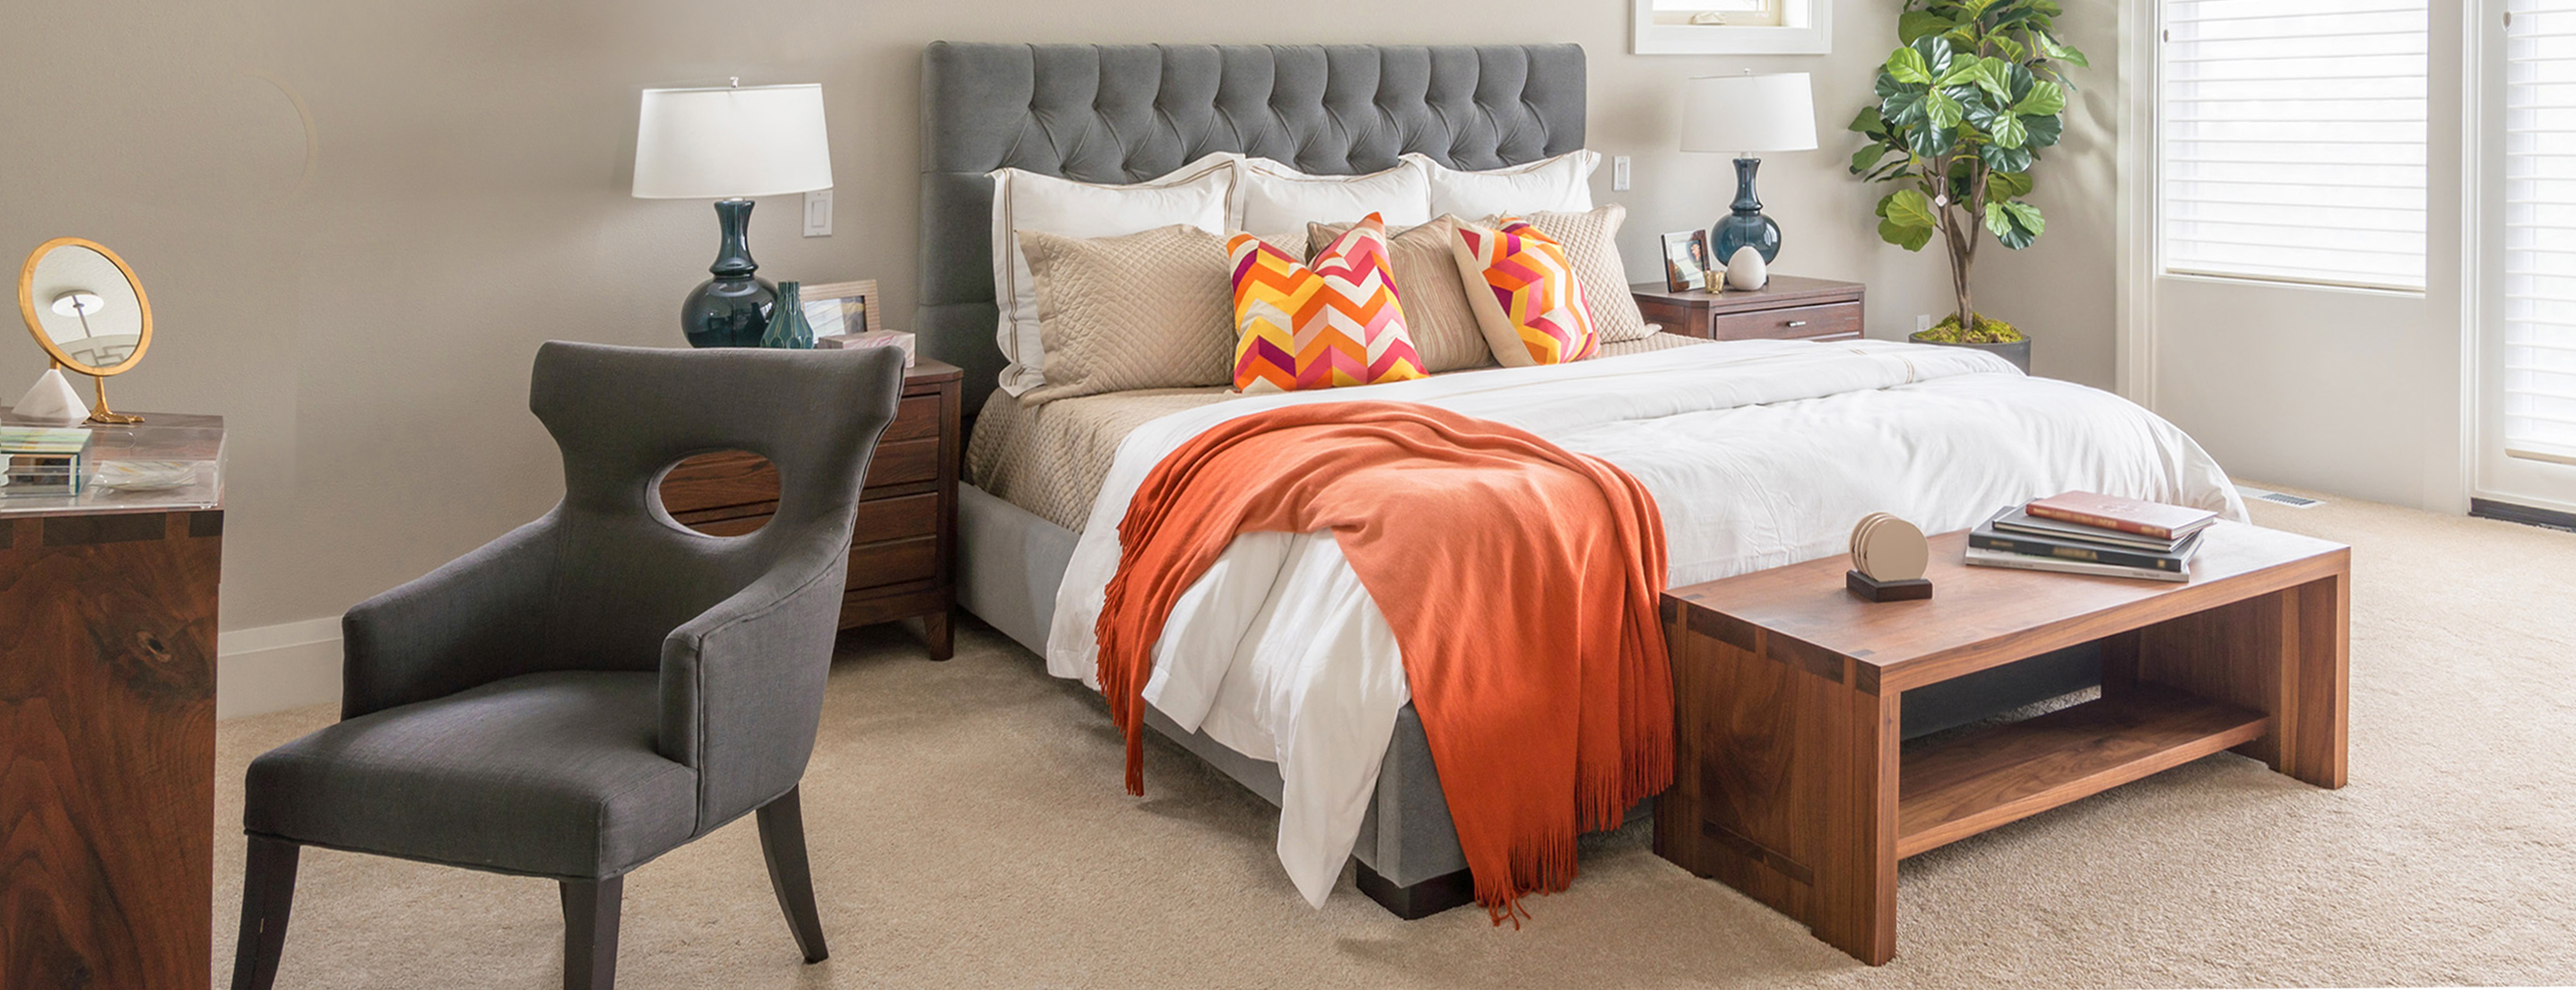 Milliard folding bed